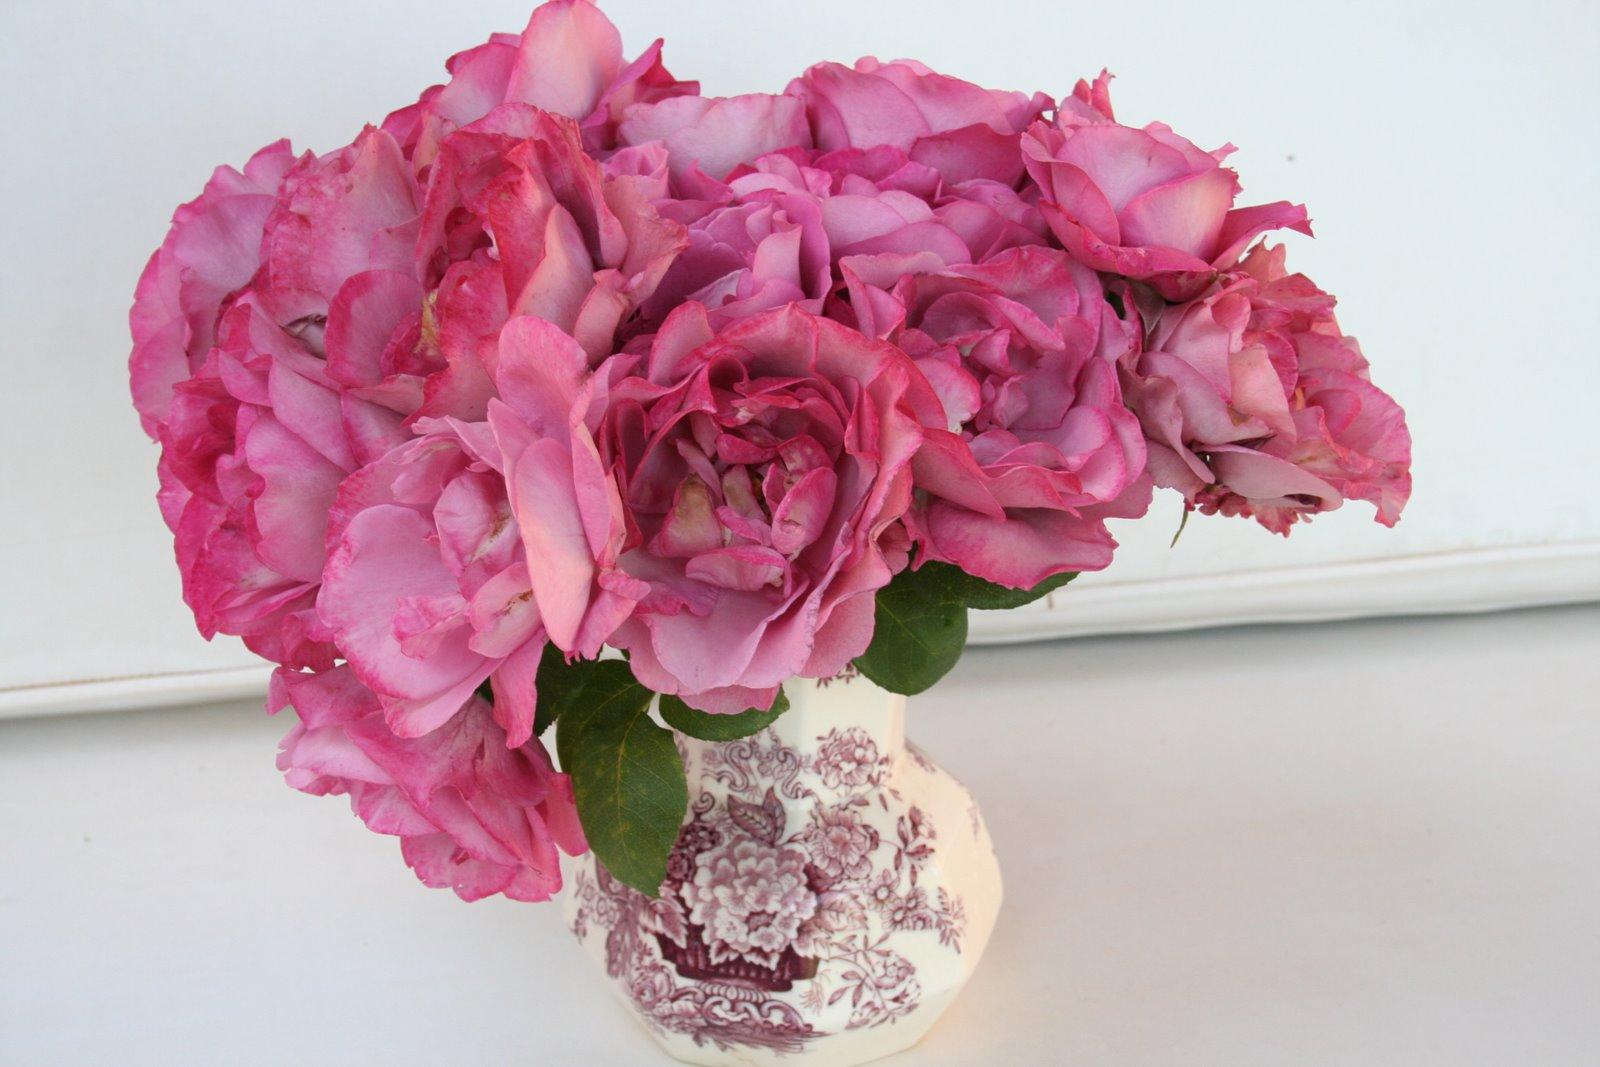 The good life in morocco heavenly scent zamzam roses thursday december 8 2011 izmirmasajfo